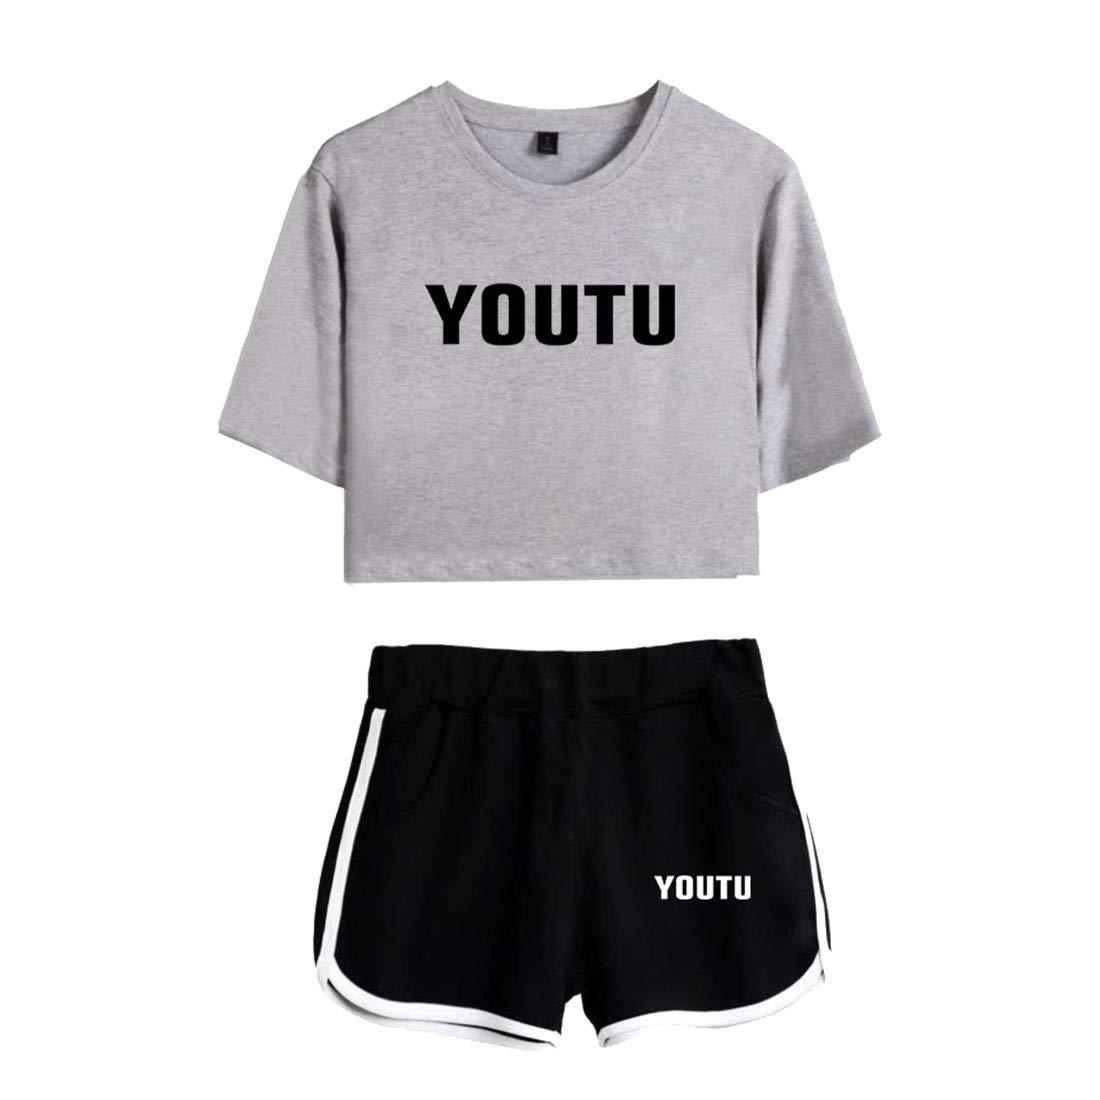 b4dd873e2e17b CTOOO T-Shirts Shorts Shawn Mendes Vêtements Commémoratifs Femme Ado Casual  Ete XS-XXL Vêtements